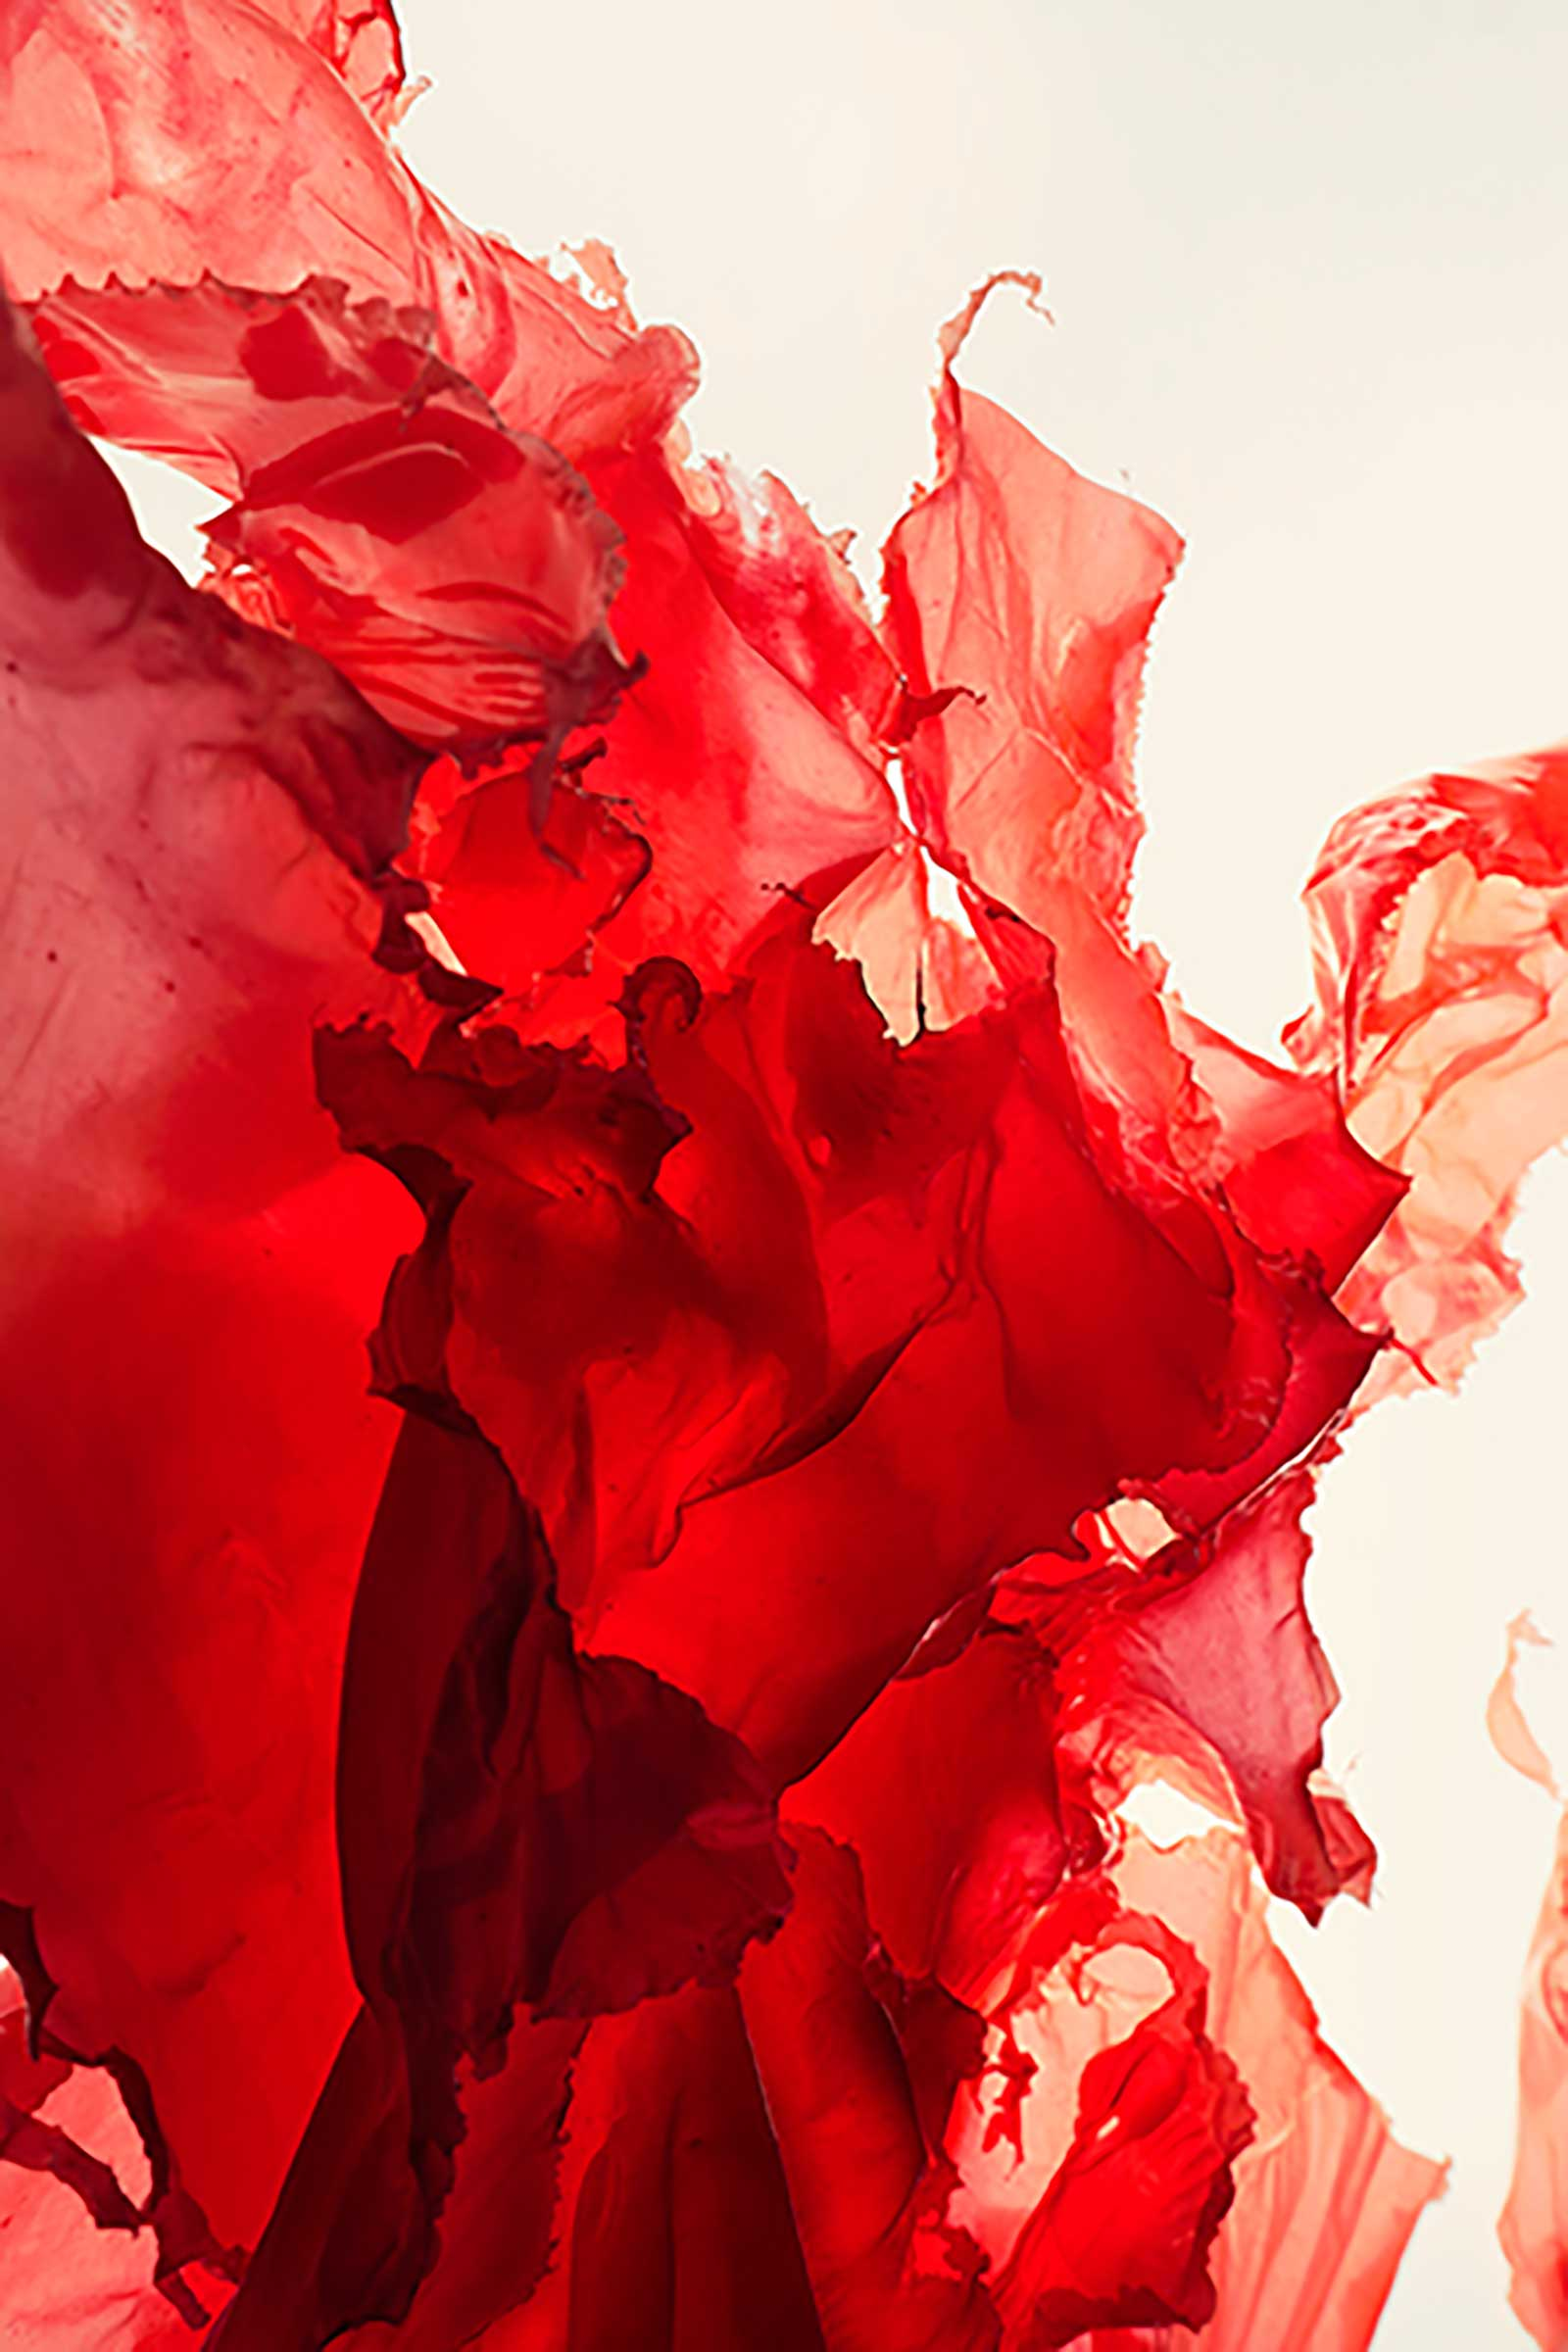 Boutique Danoise Ausstellung Flavia Schaub Basel Rot Fotografie